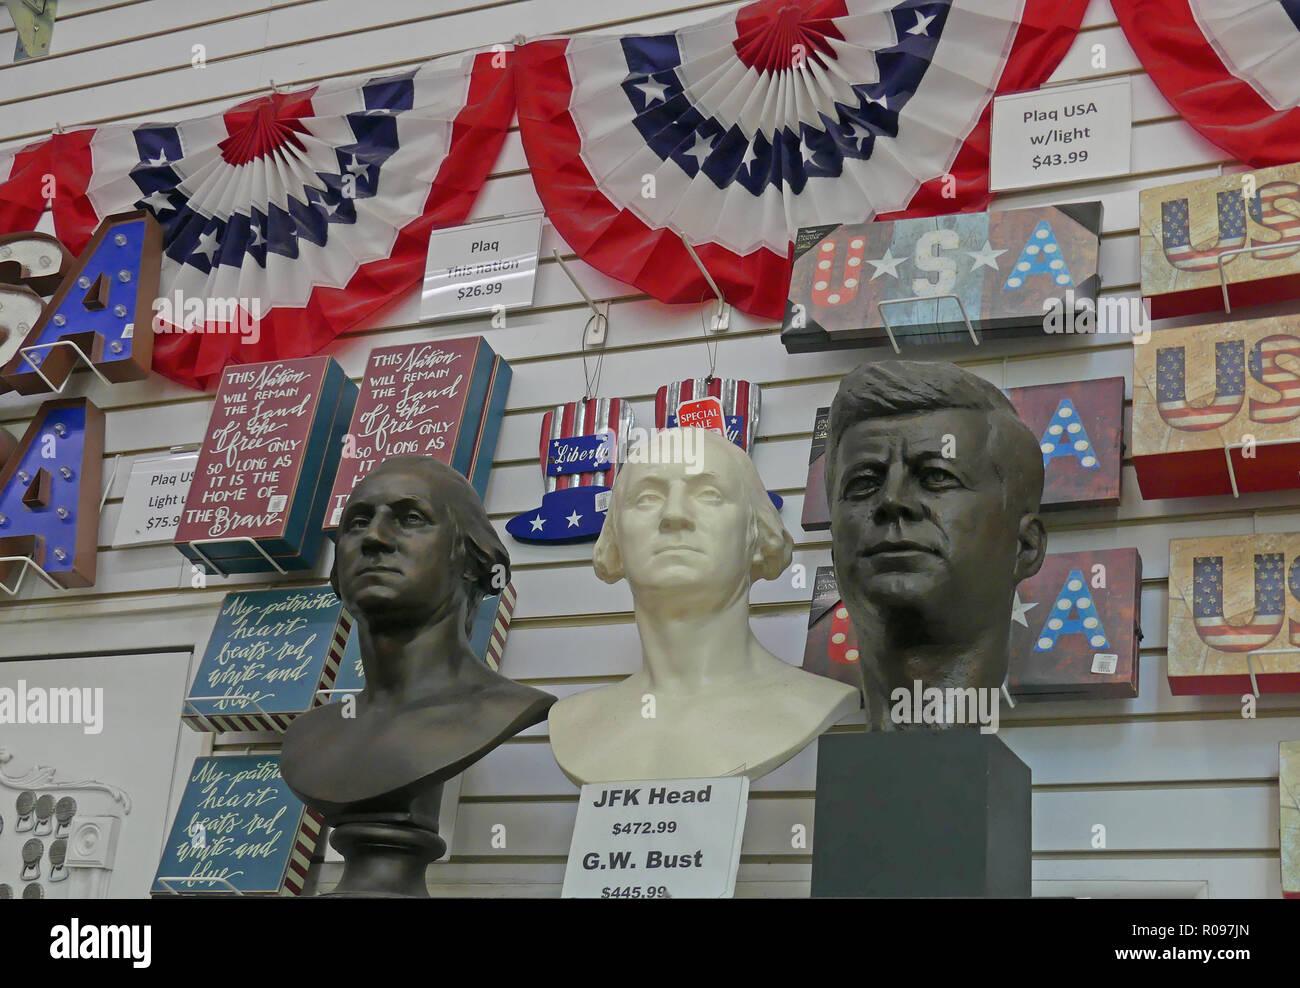 AMERICAN PRESIDENTIAL MEMORABILIA in Washington D.C. Photo: Tony Gale - Stock Image